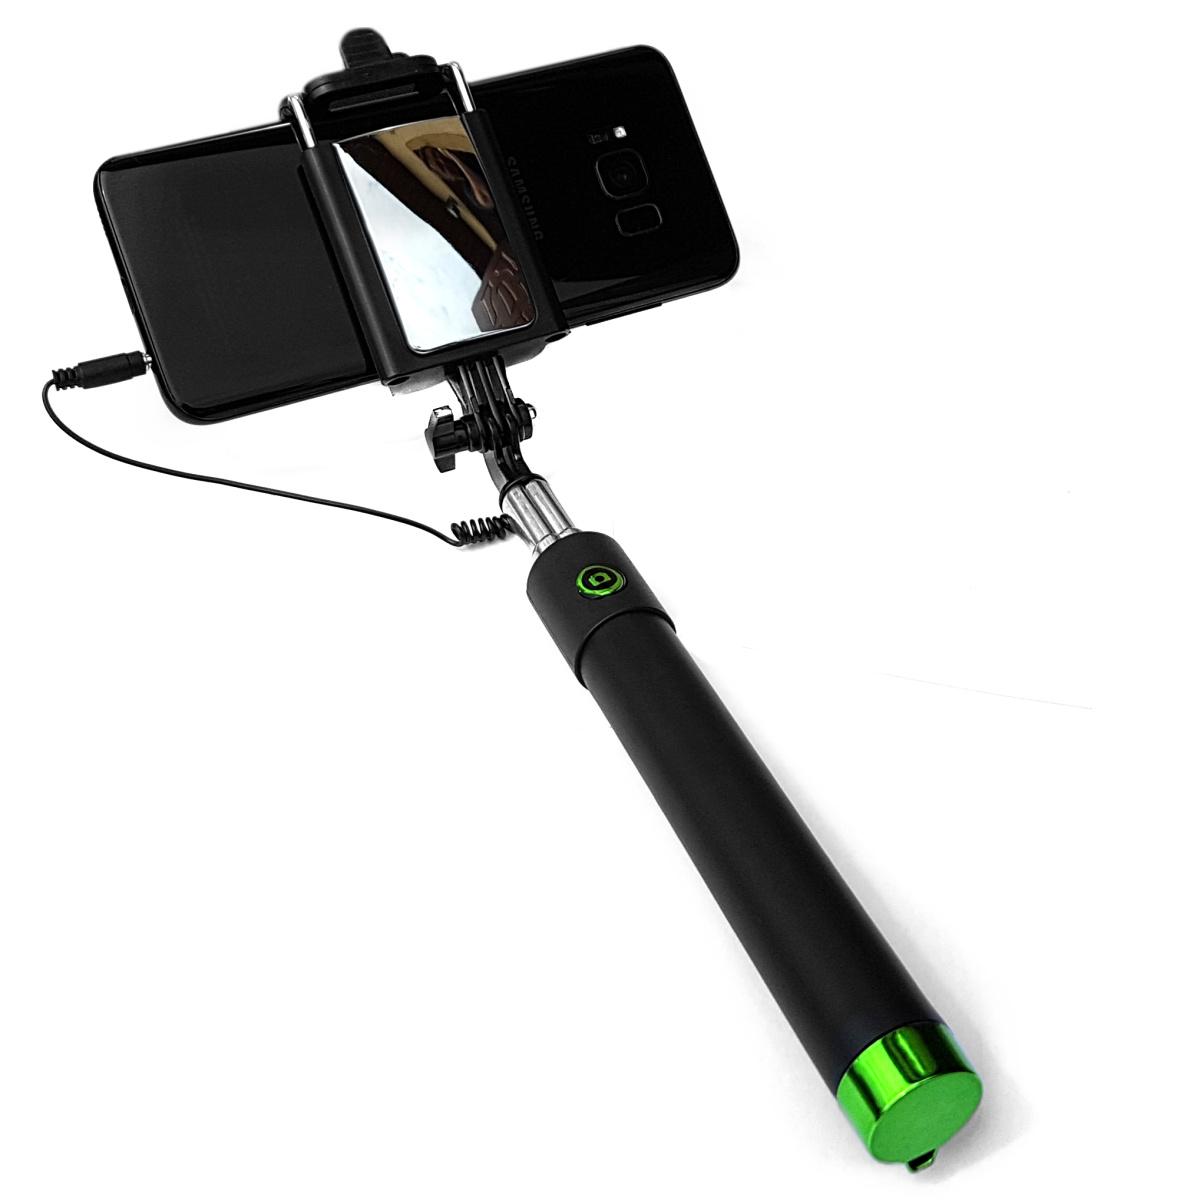 Kijek Selfiestick Monopod LG K4 2017/ K4 2017 Dual